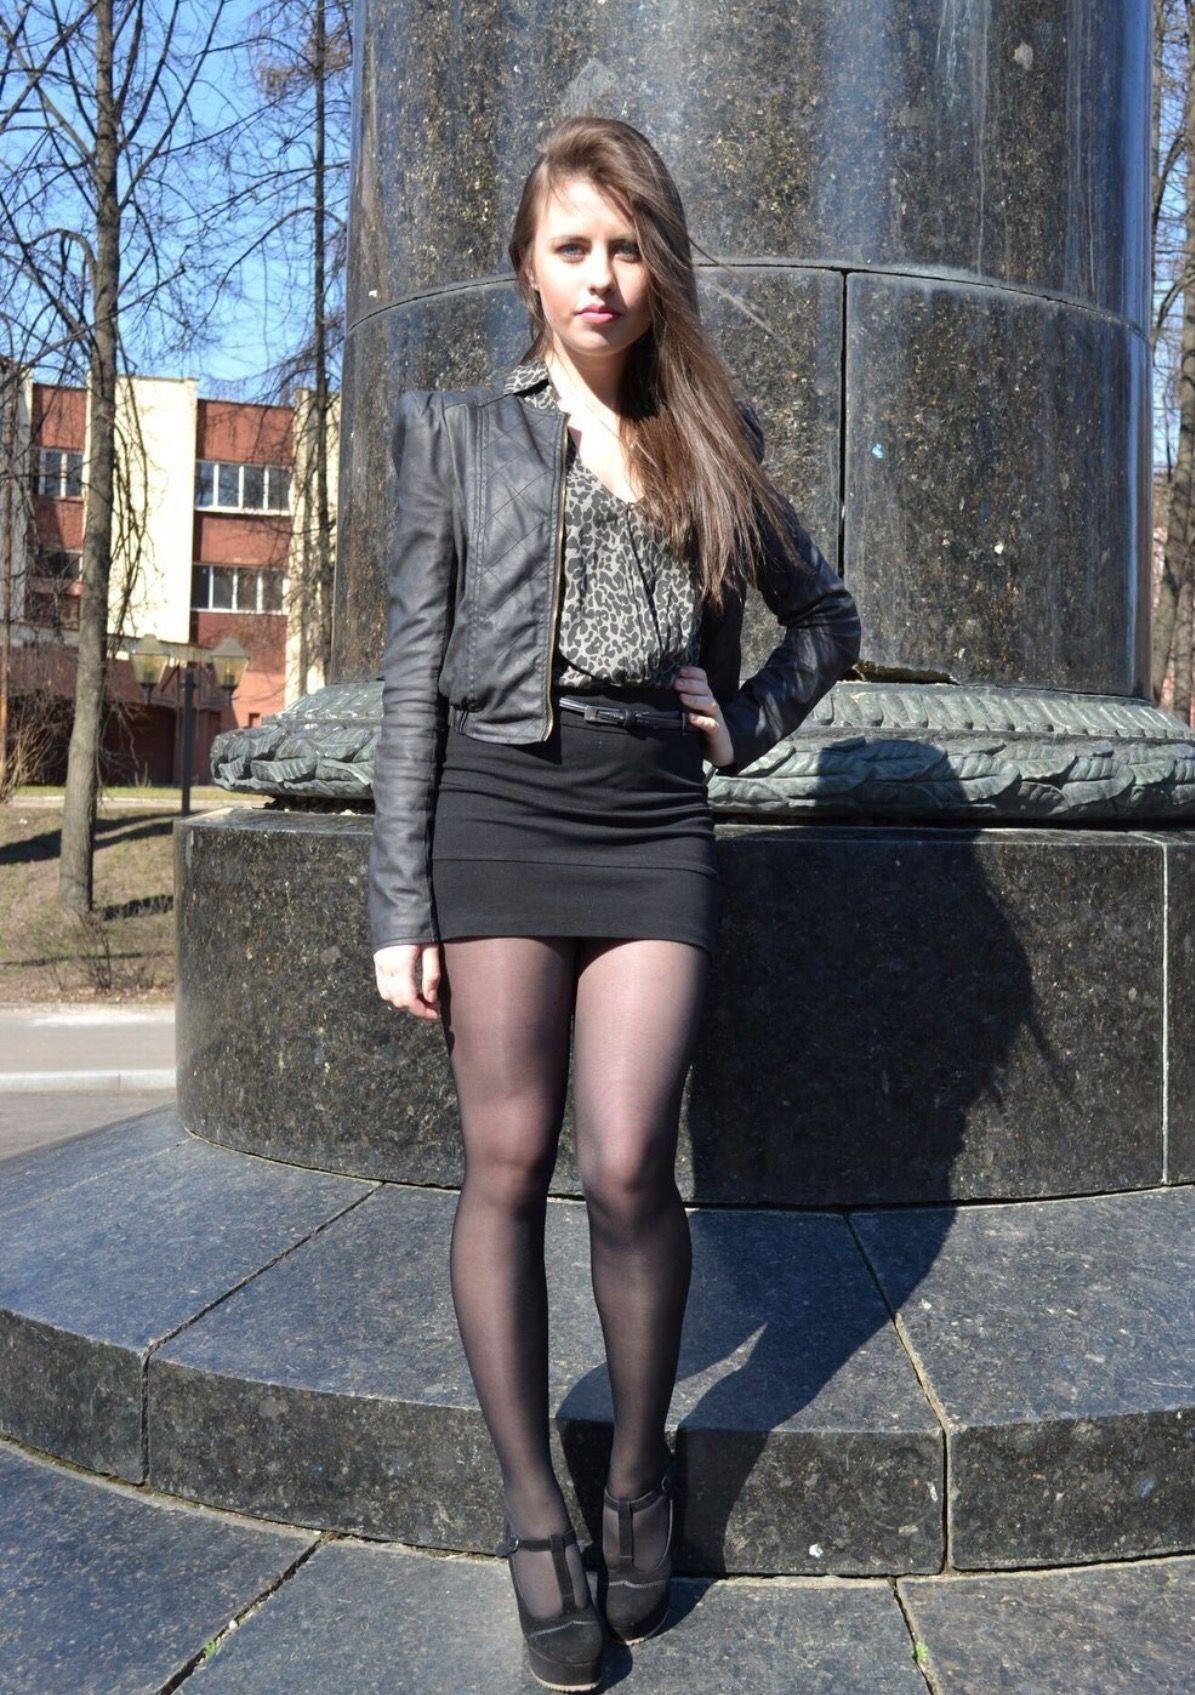 Astonishing Teen In Miniskirt And Shiny Tights Pantyhose